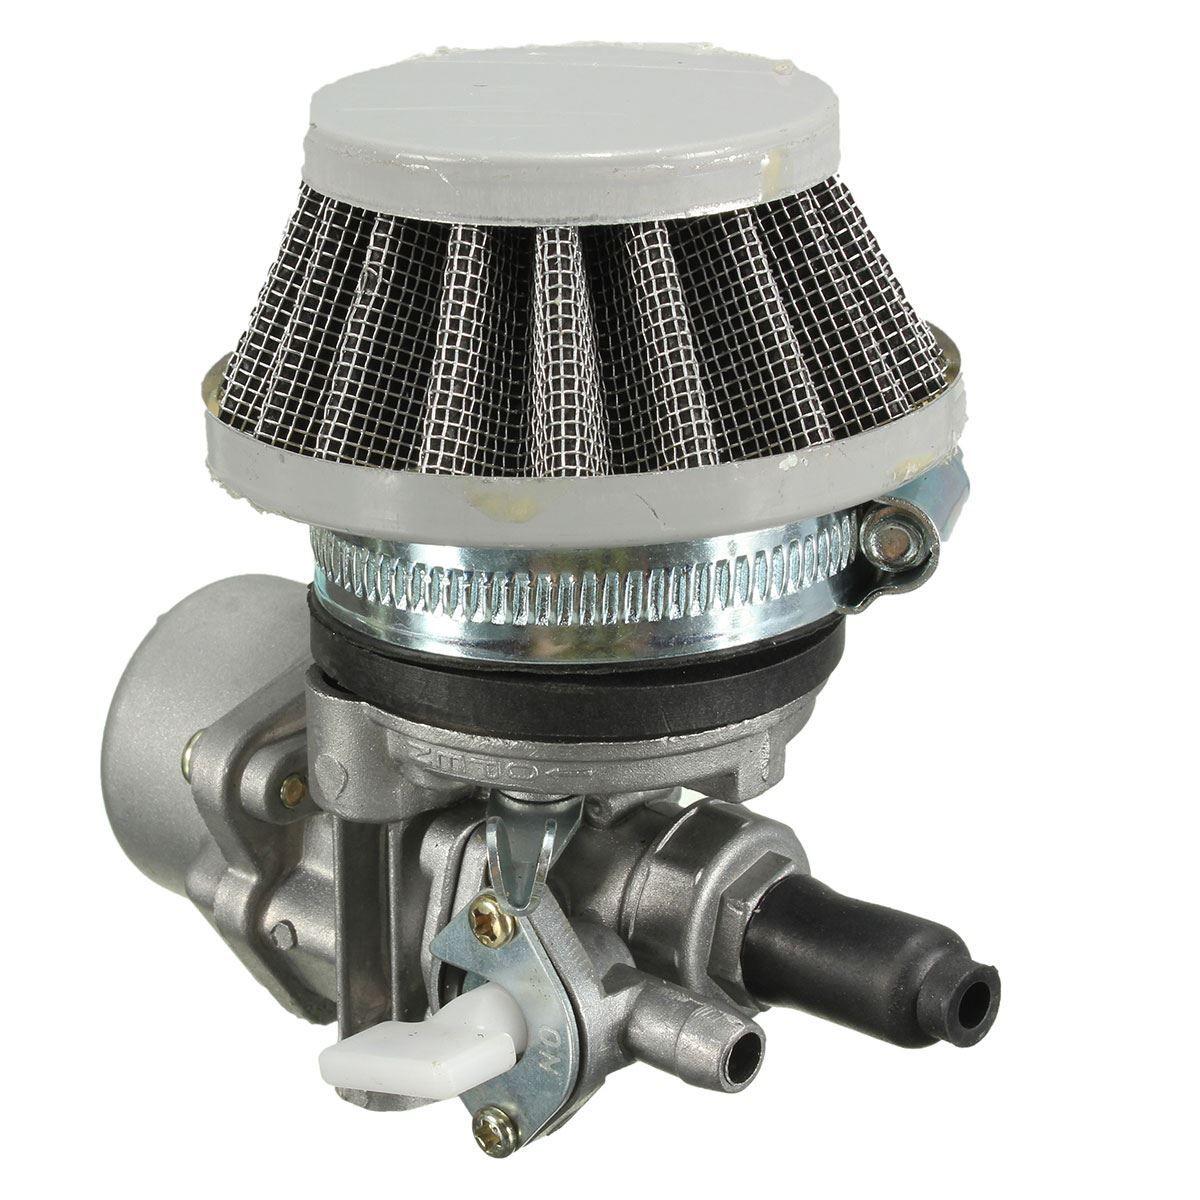 Mini Carb Carburetor w/ Air Filter For 47cc 49cc Mini Moto ATV Dirt Pocket Bike